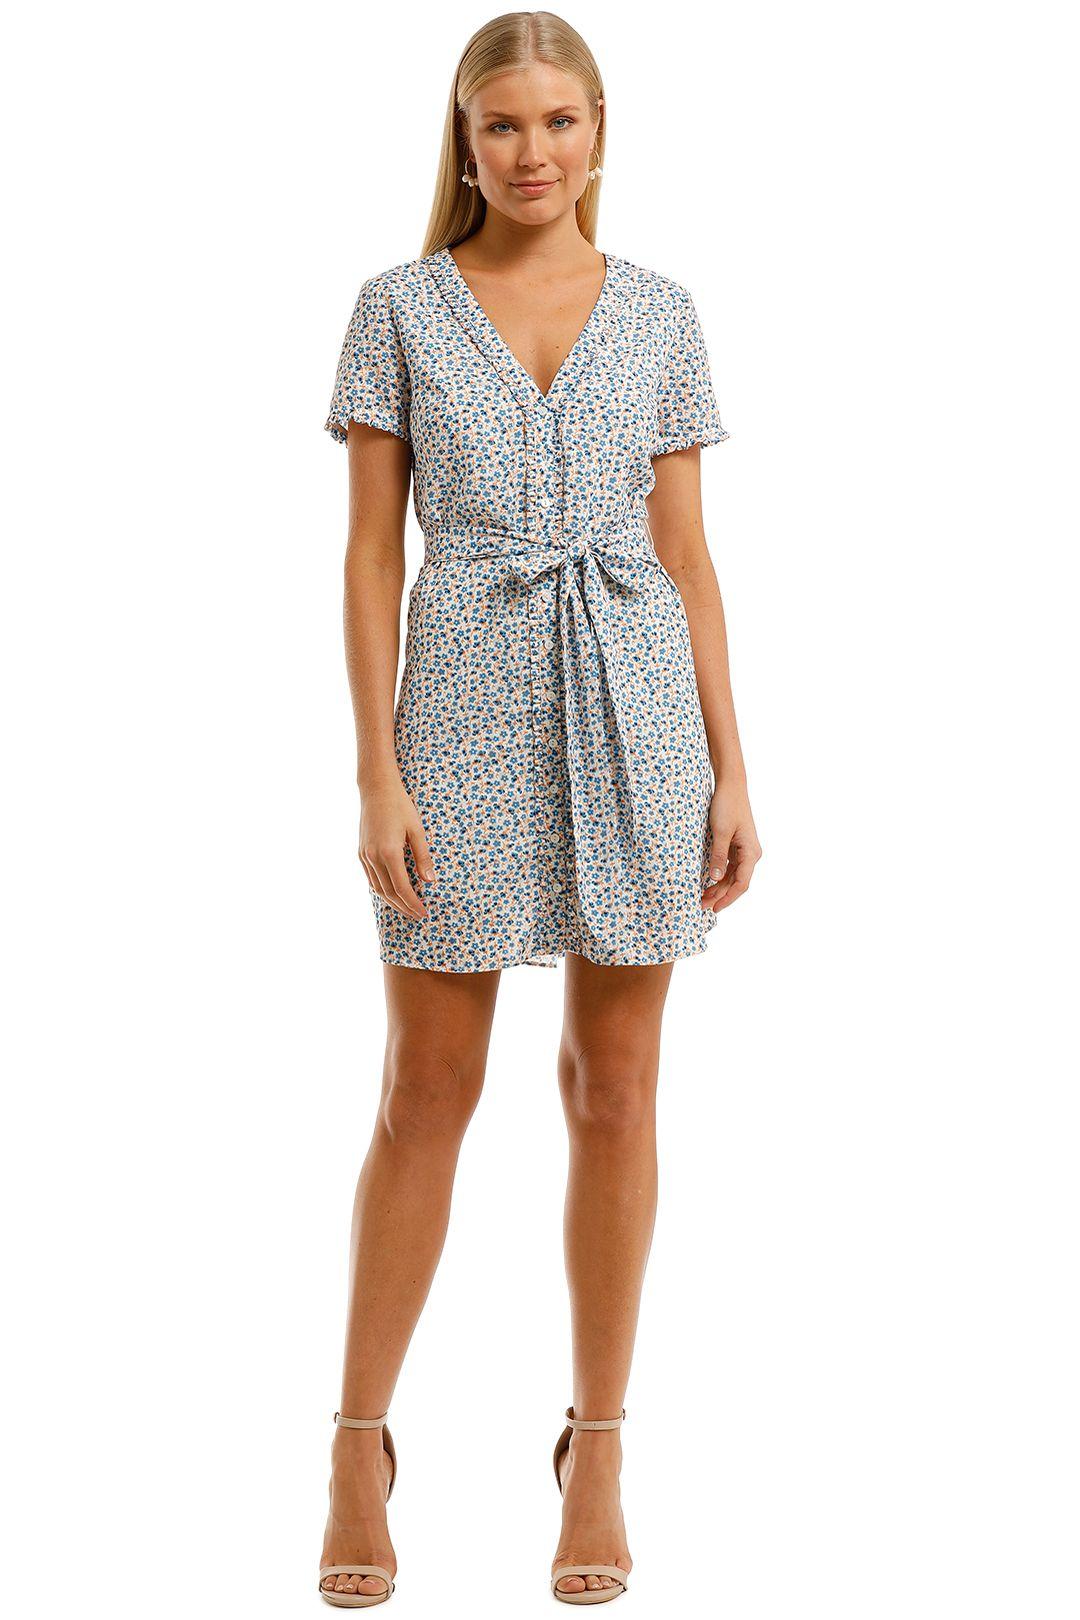 The-East-Order-Charlotte-Mini-Dress-Blue-Floral-Print-Front